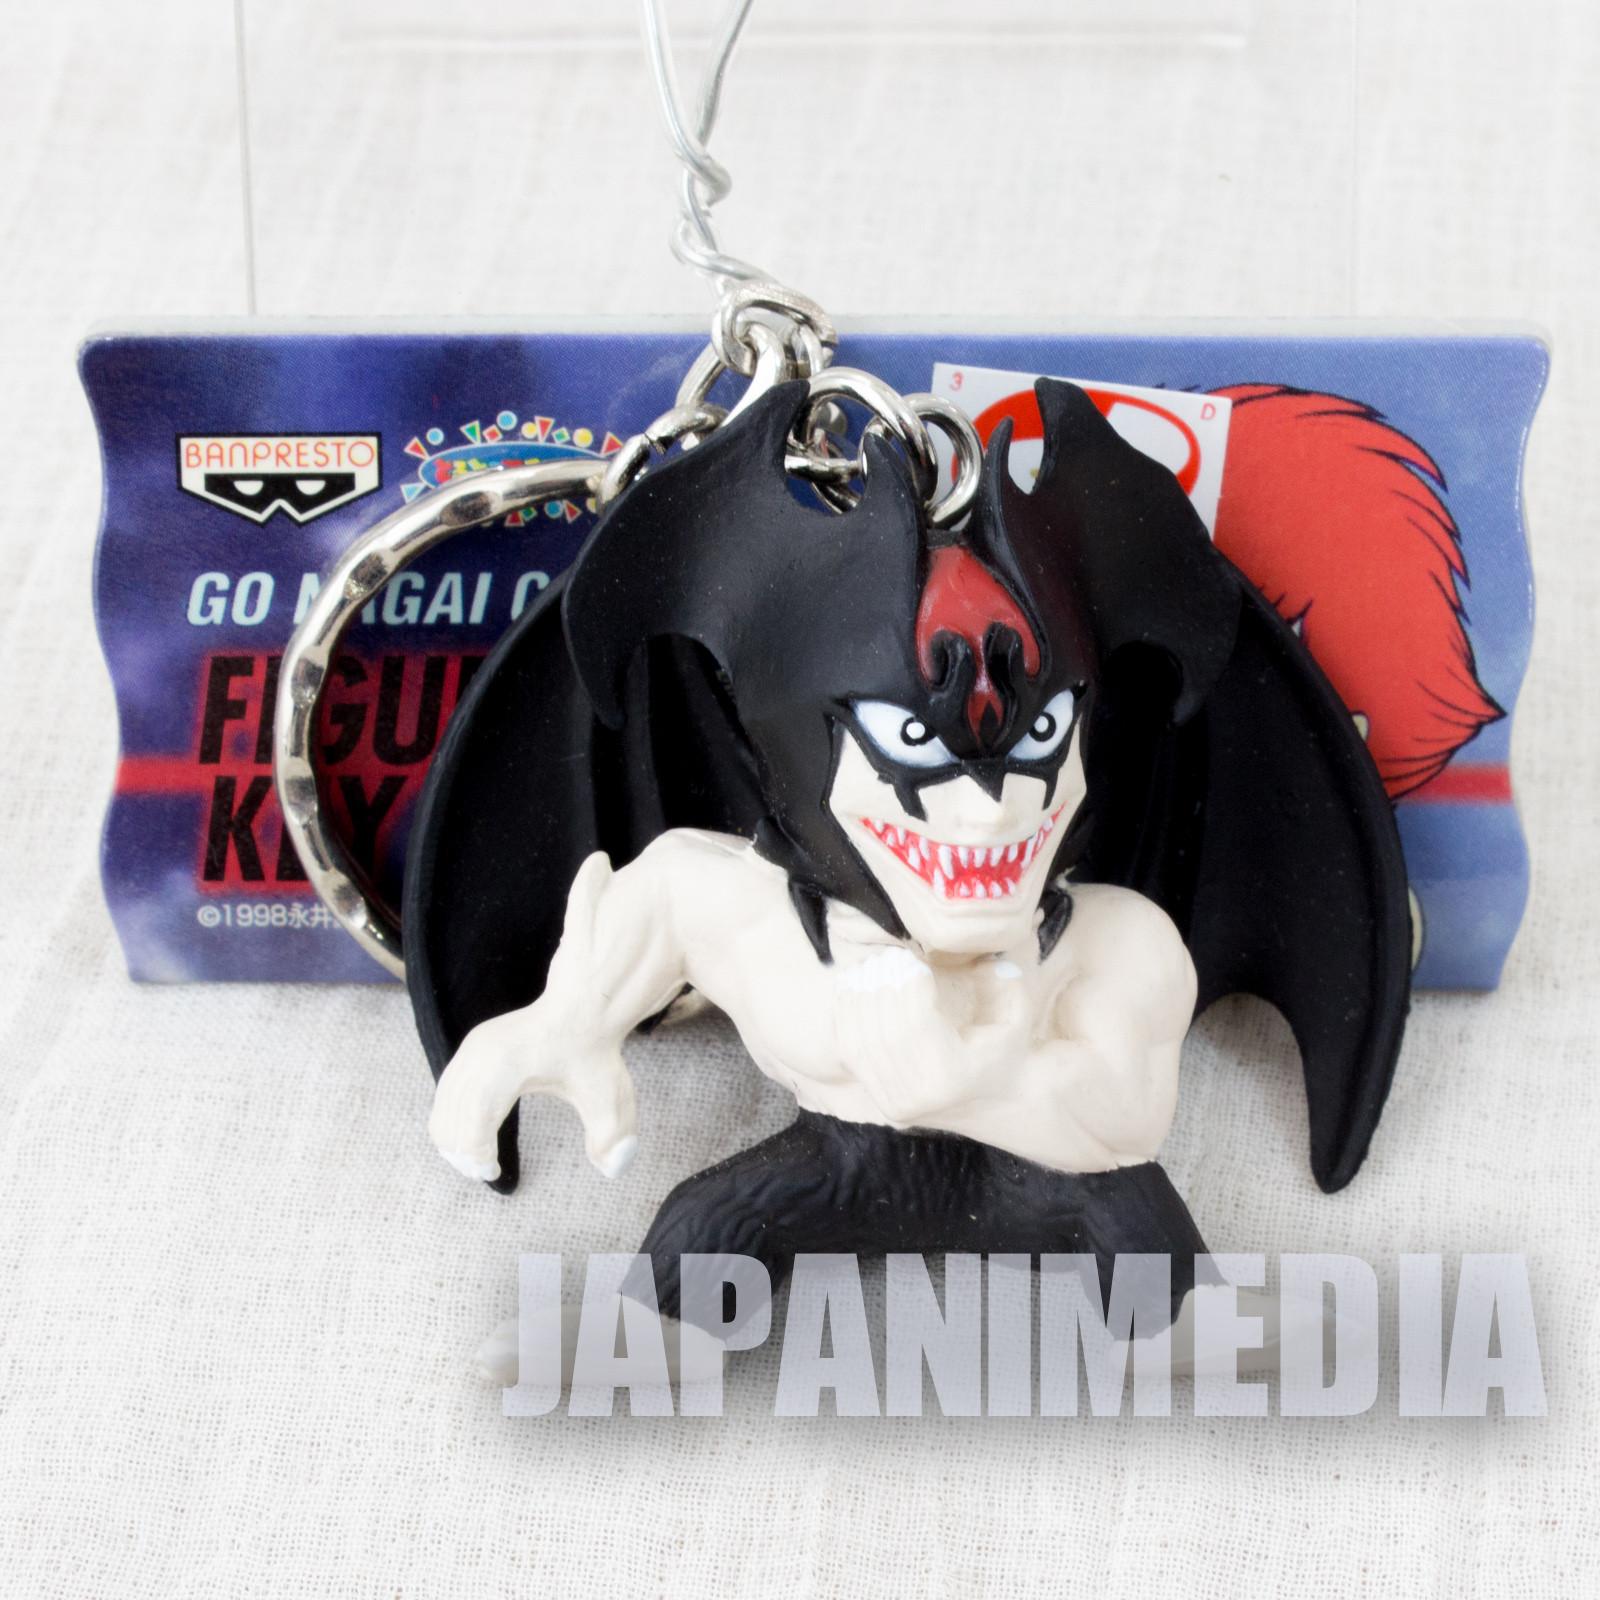 Devilman Comics Ver. Nagai Go Characters Figure Key Chain Banpresto JAPAN ANIME 3